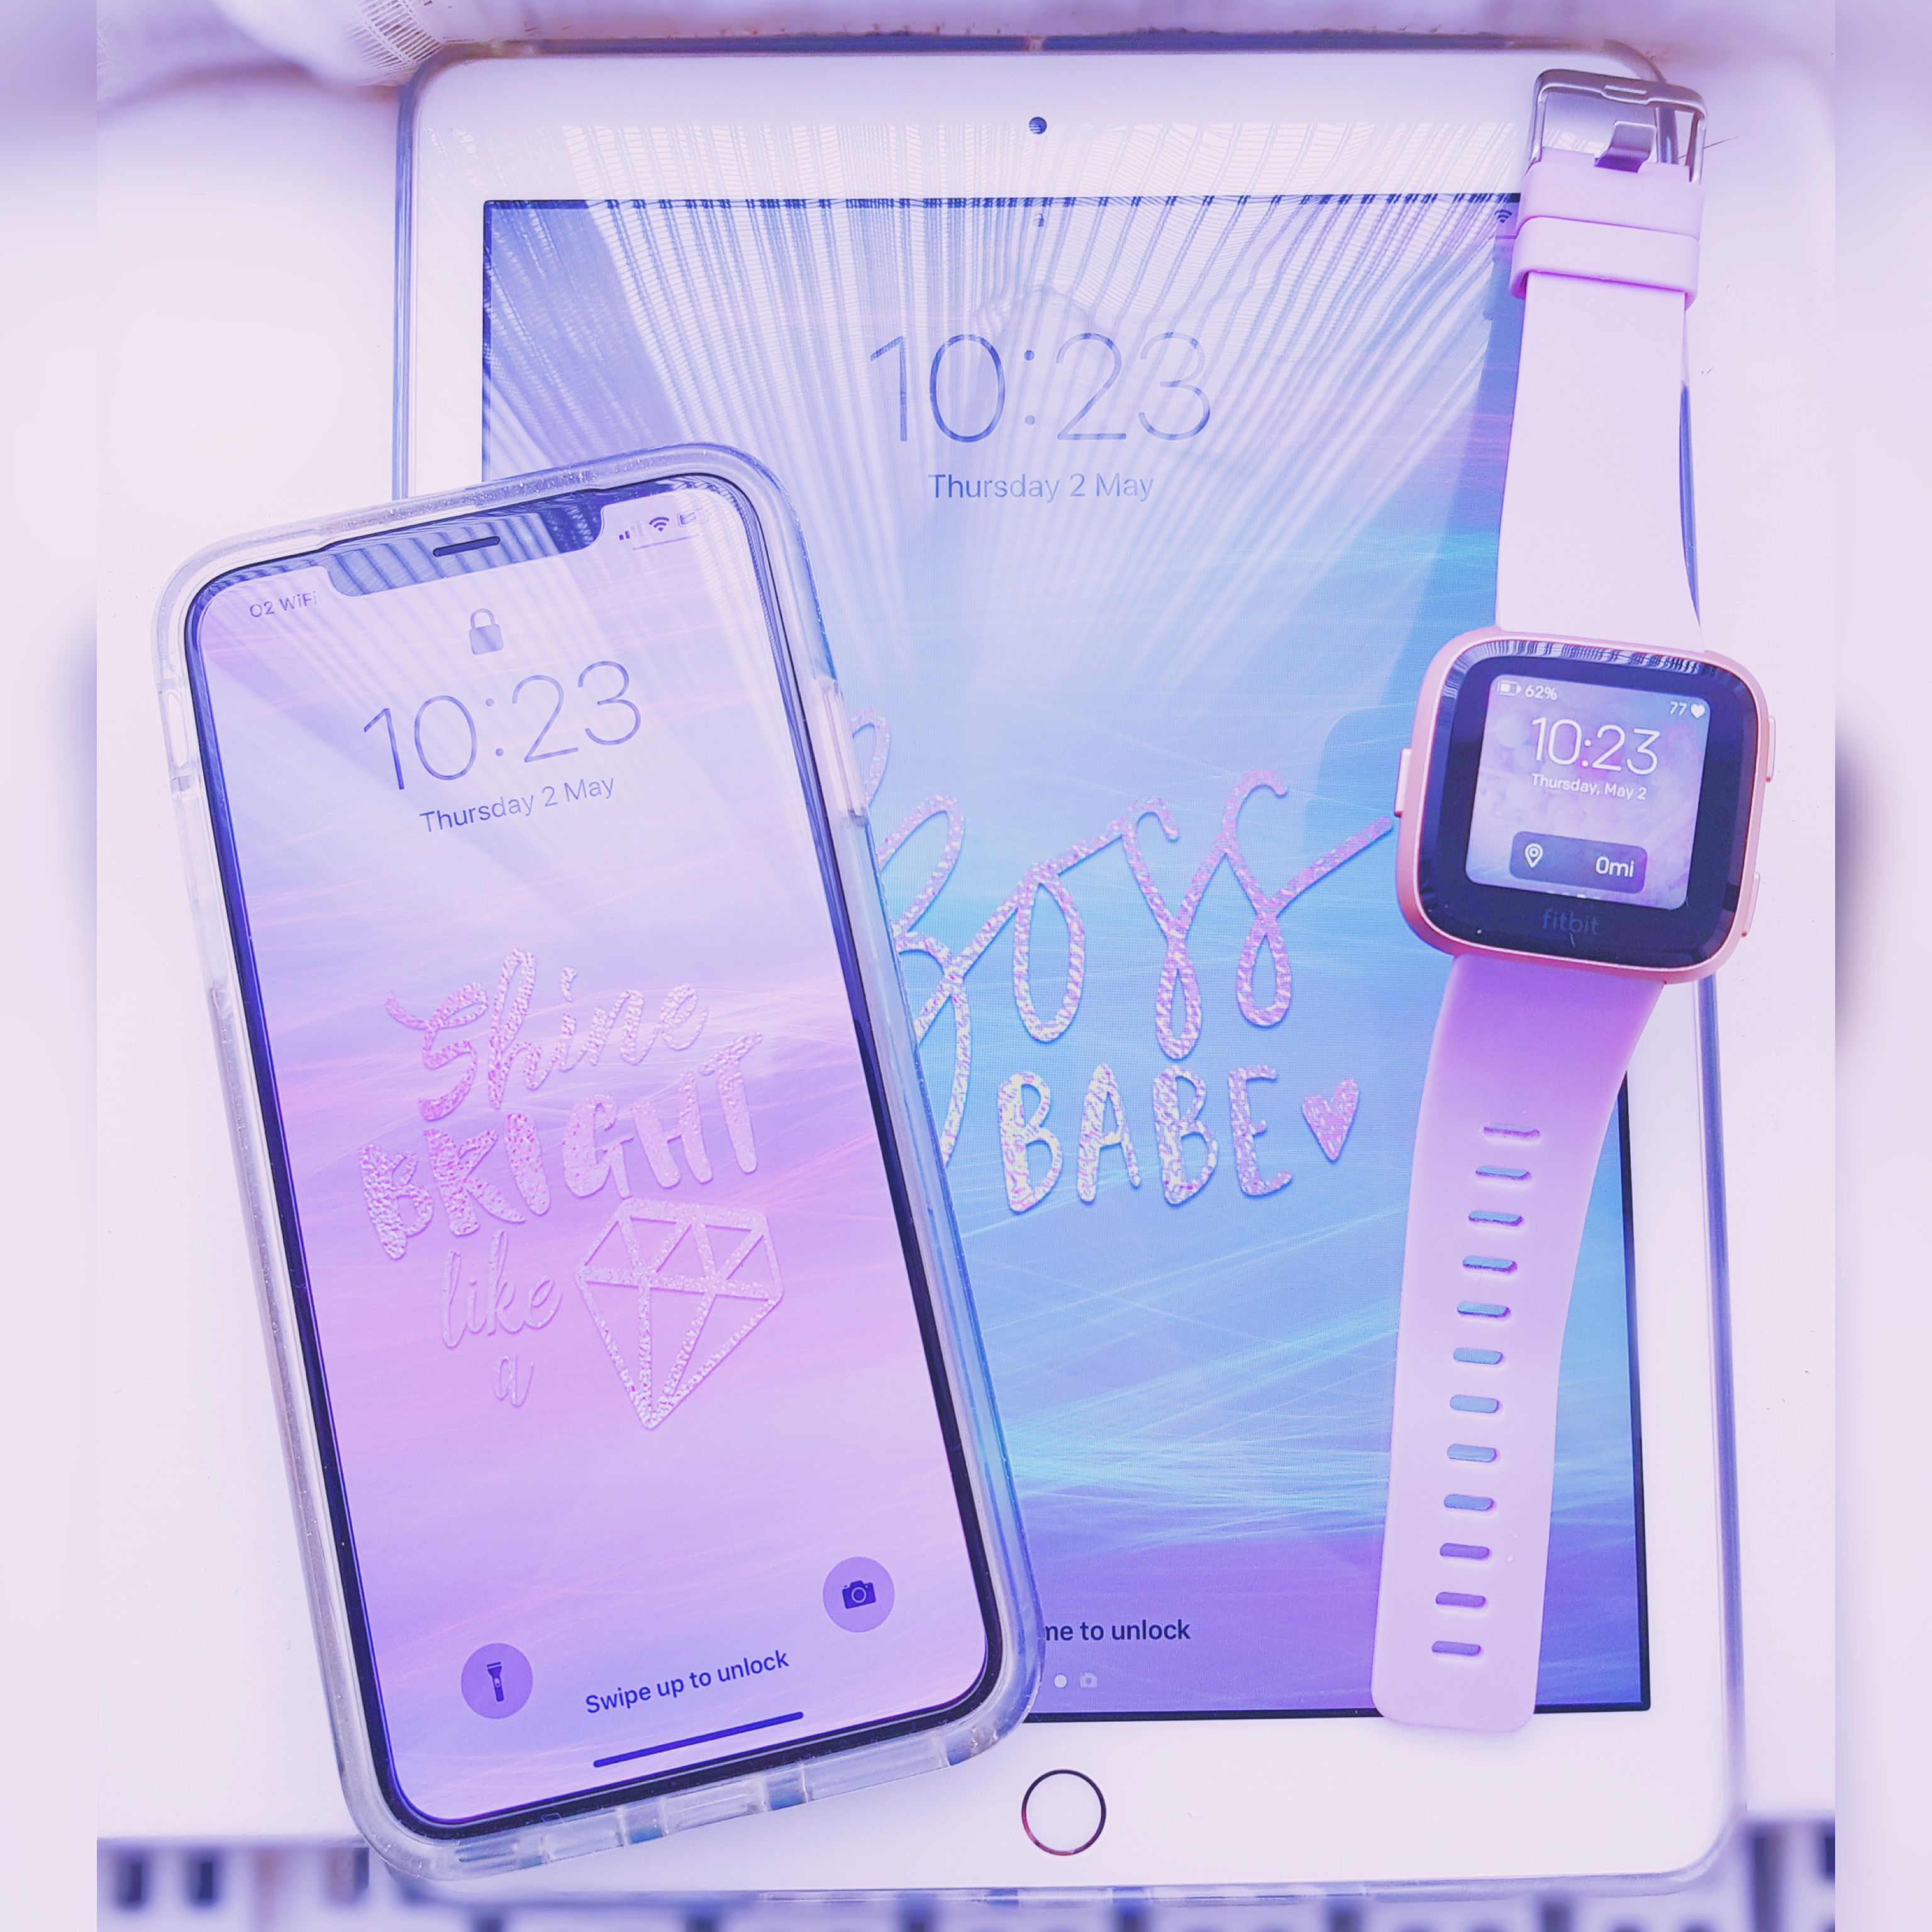 iPhone, iPhone XS Max, iPad 2018, Fitbit Versa, Tech